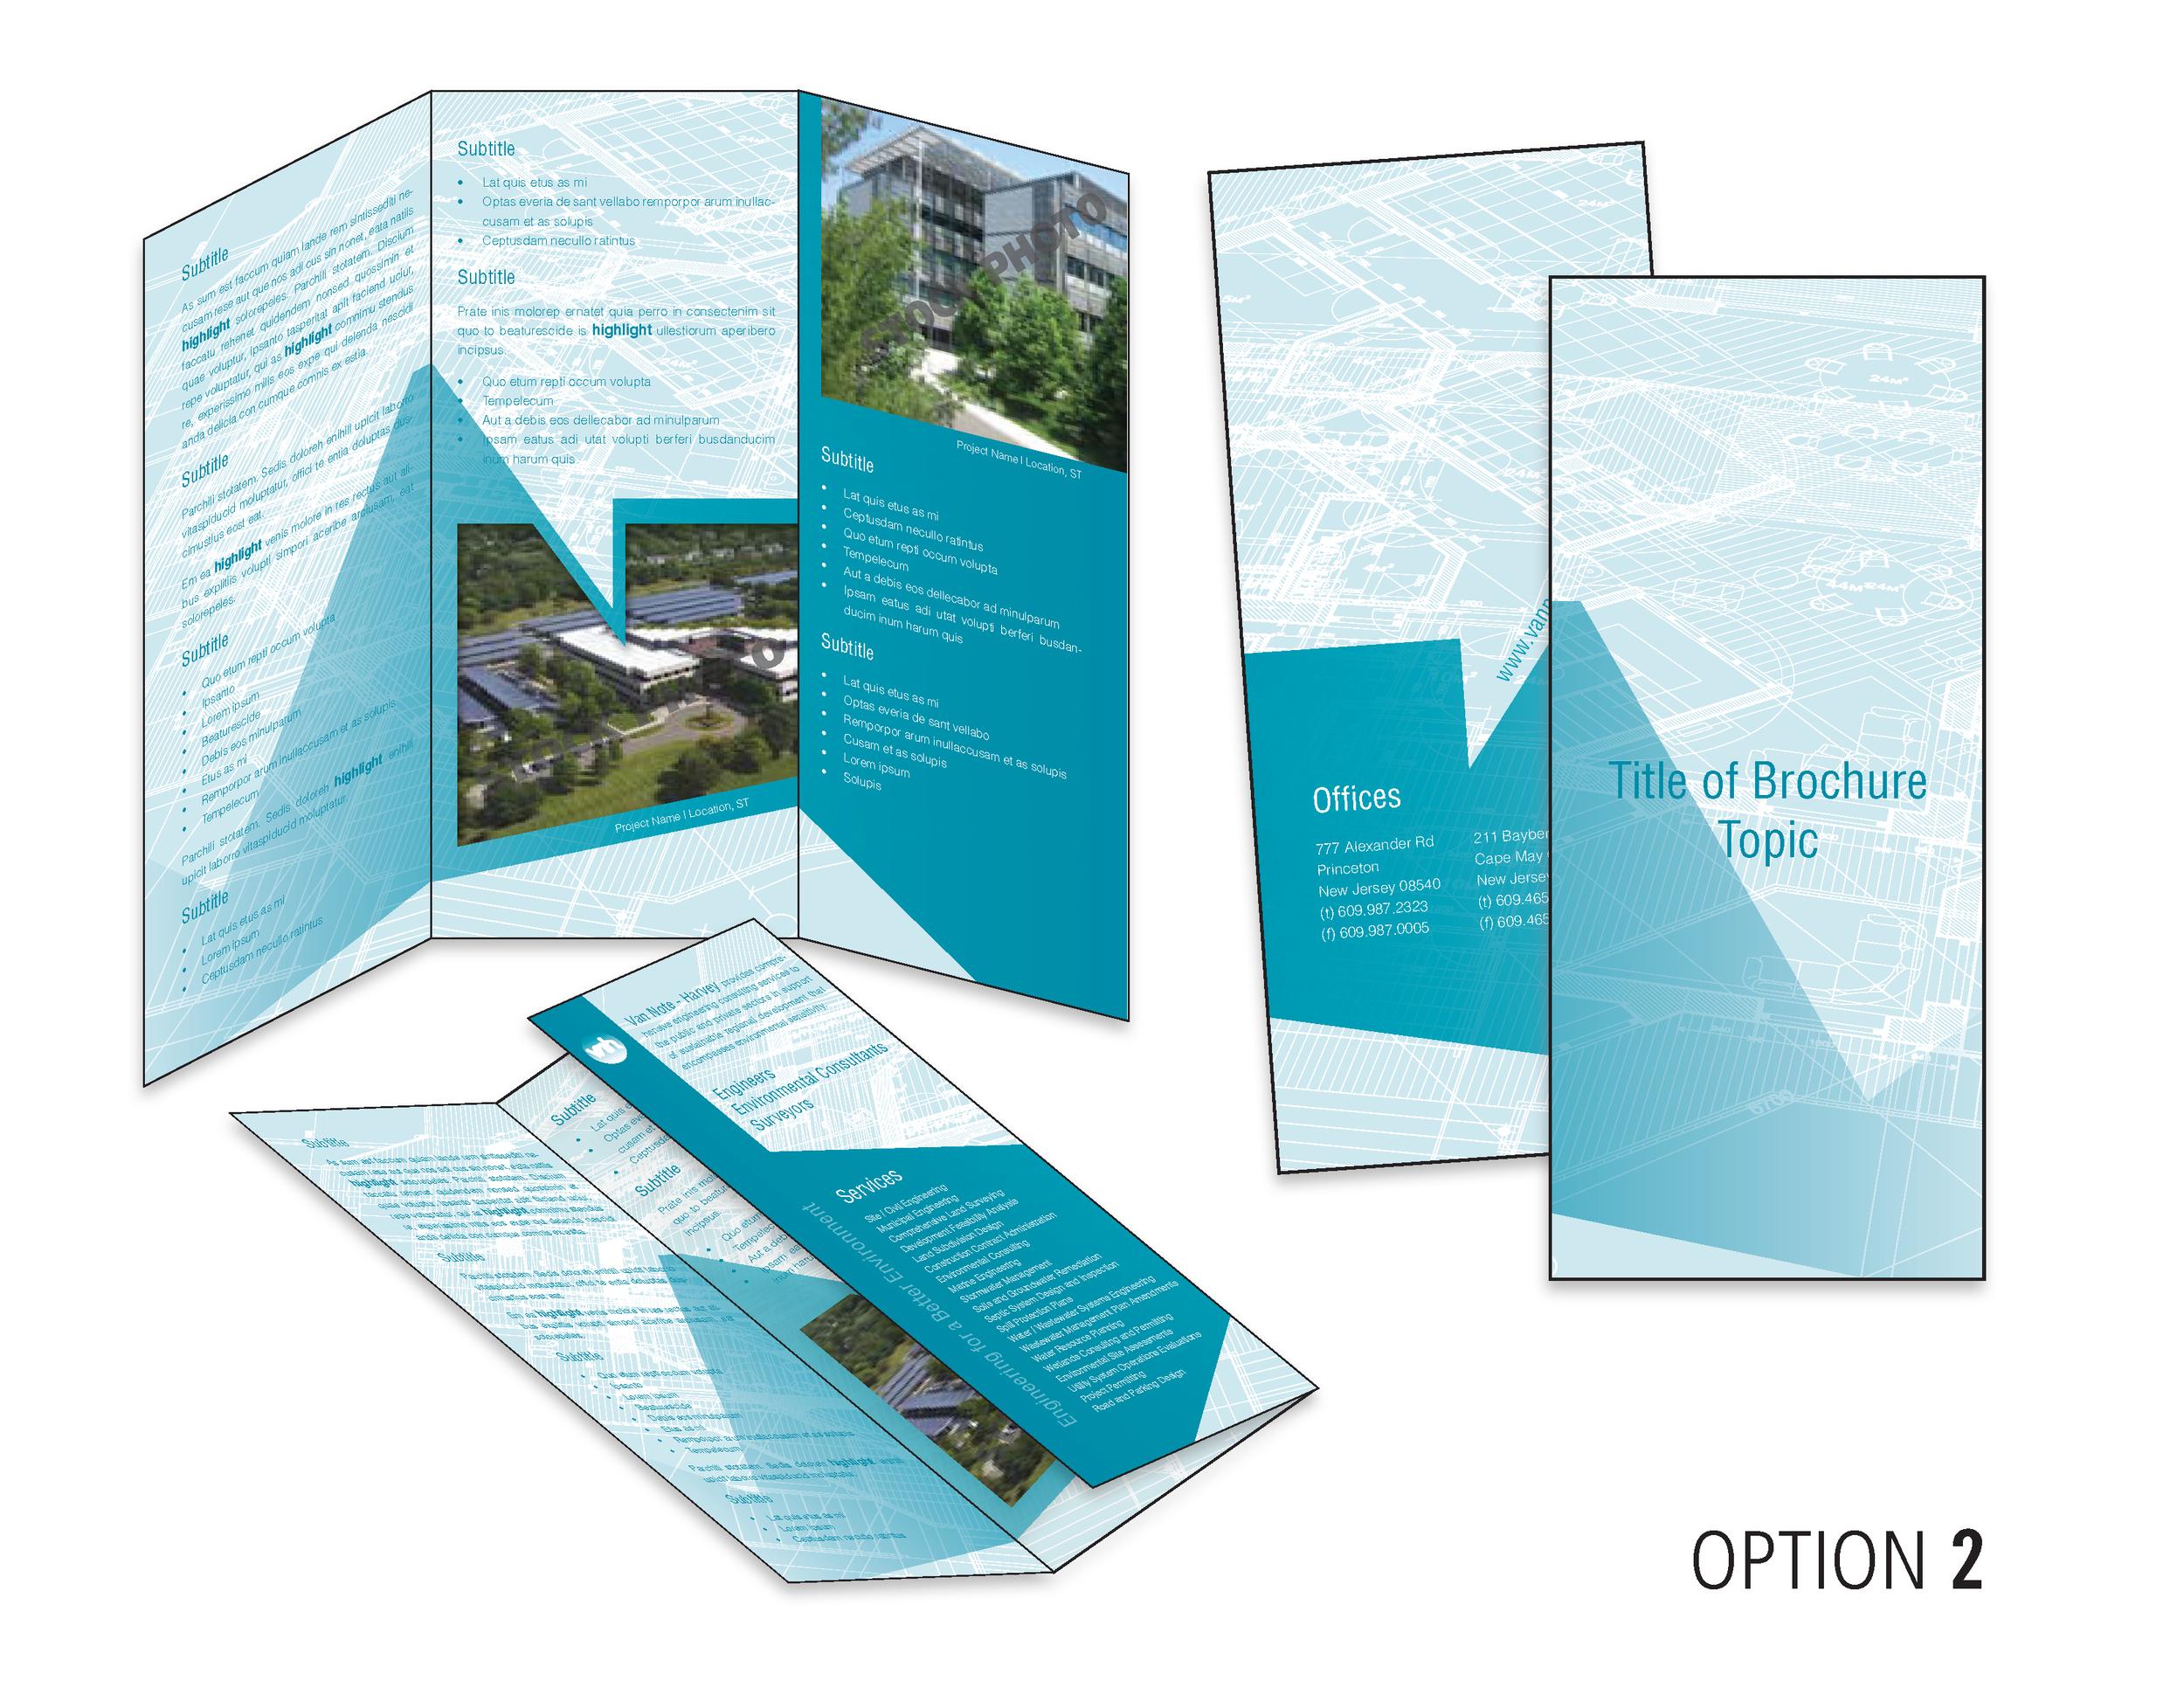 Round 1, tri-fold design option.